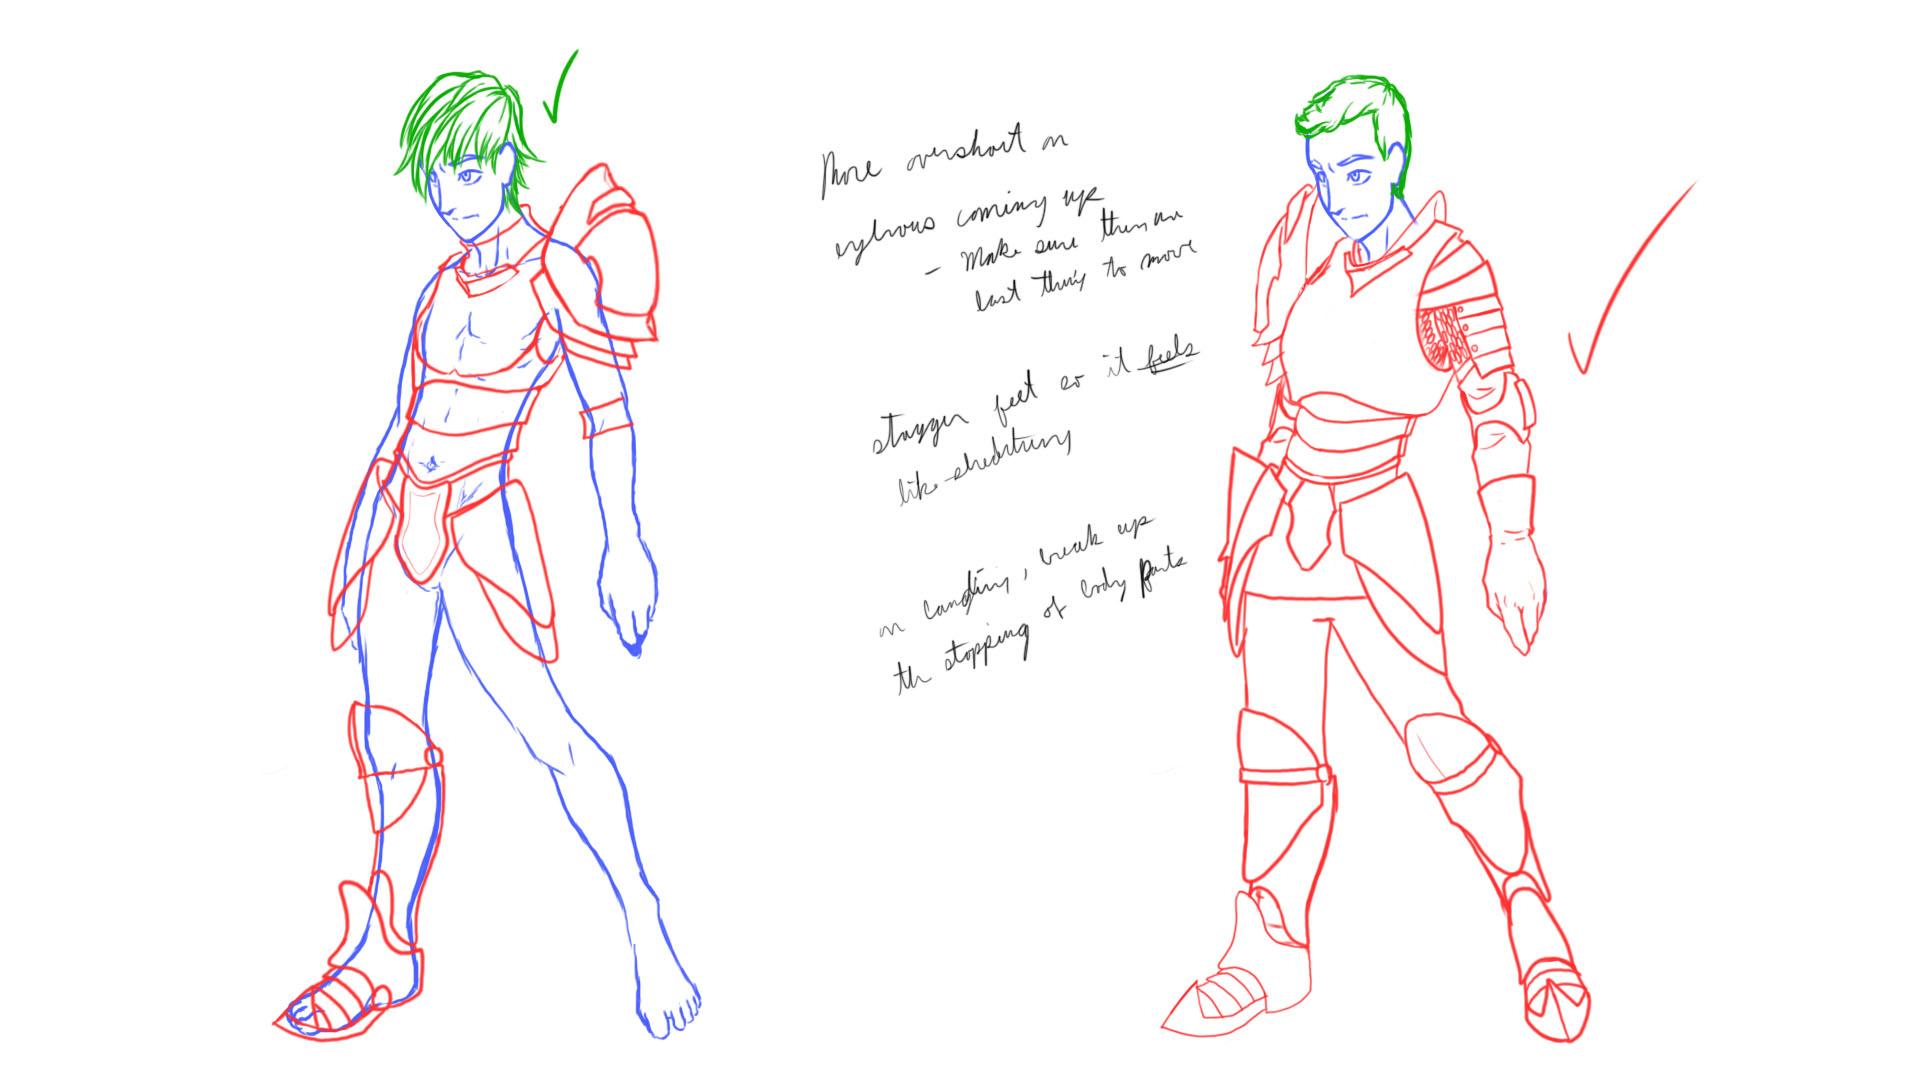 Nick: Armor Concept 3